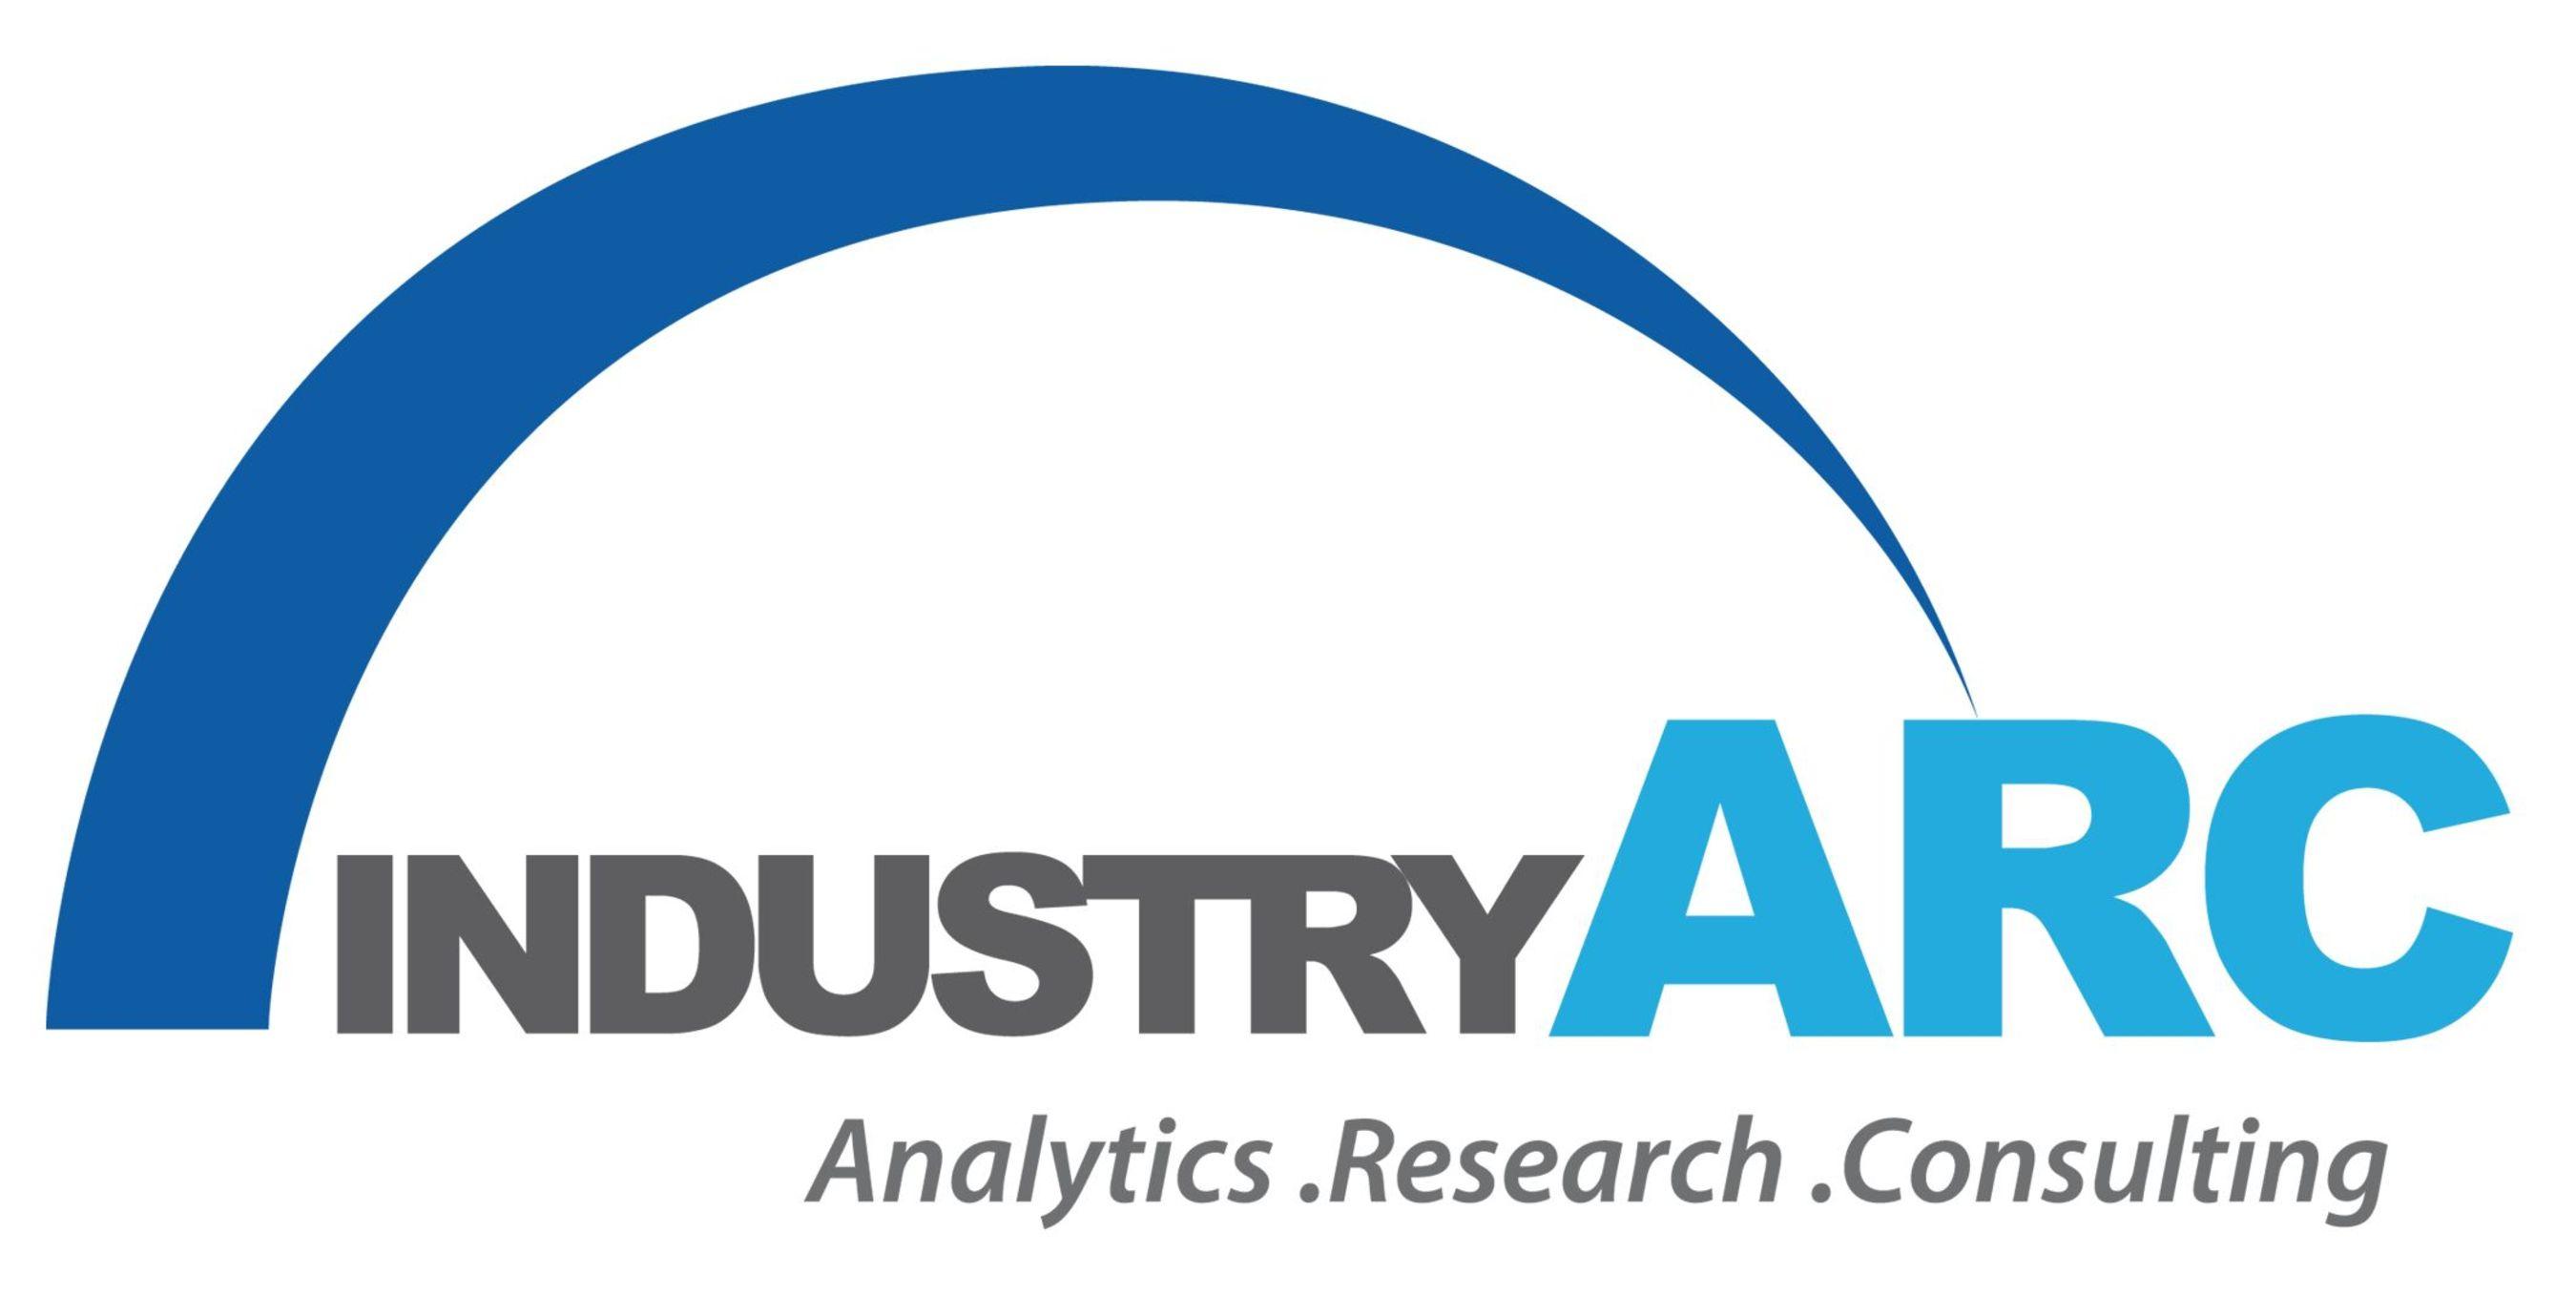 PR NEWSWIRE EUROPE - IndustryARC Logo (PRNewsFoto/IndustryARC)